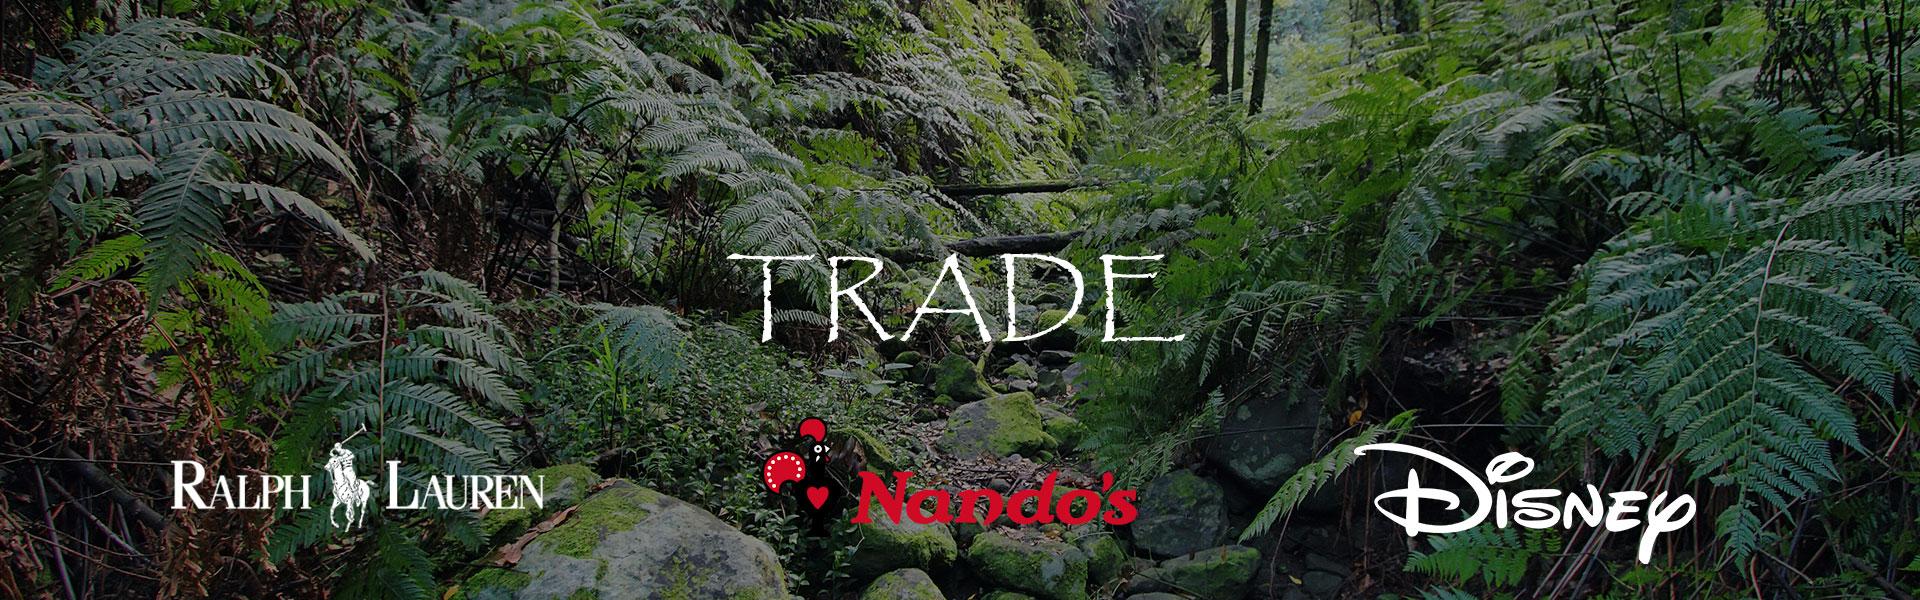 Trade driftwood